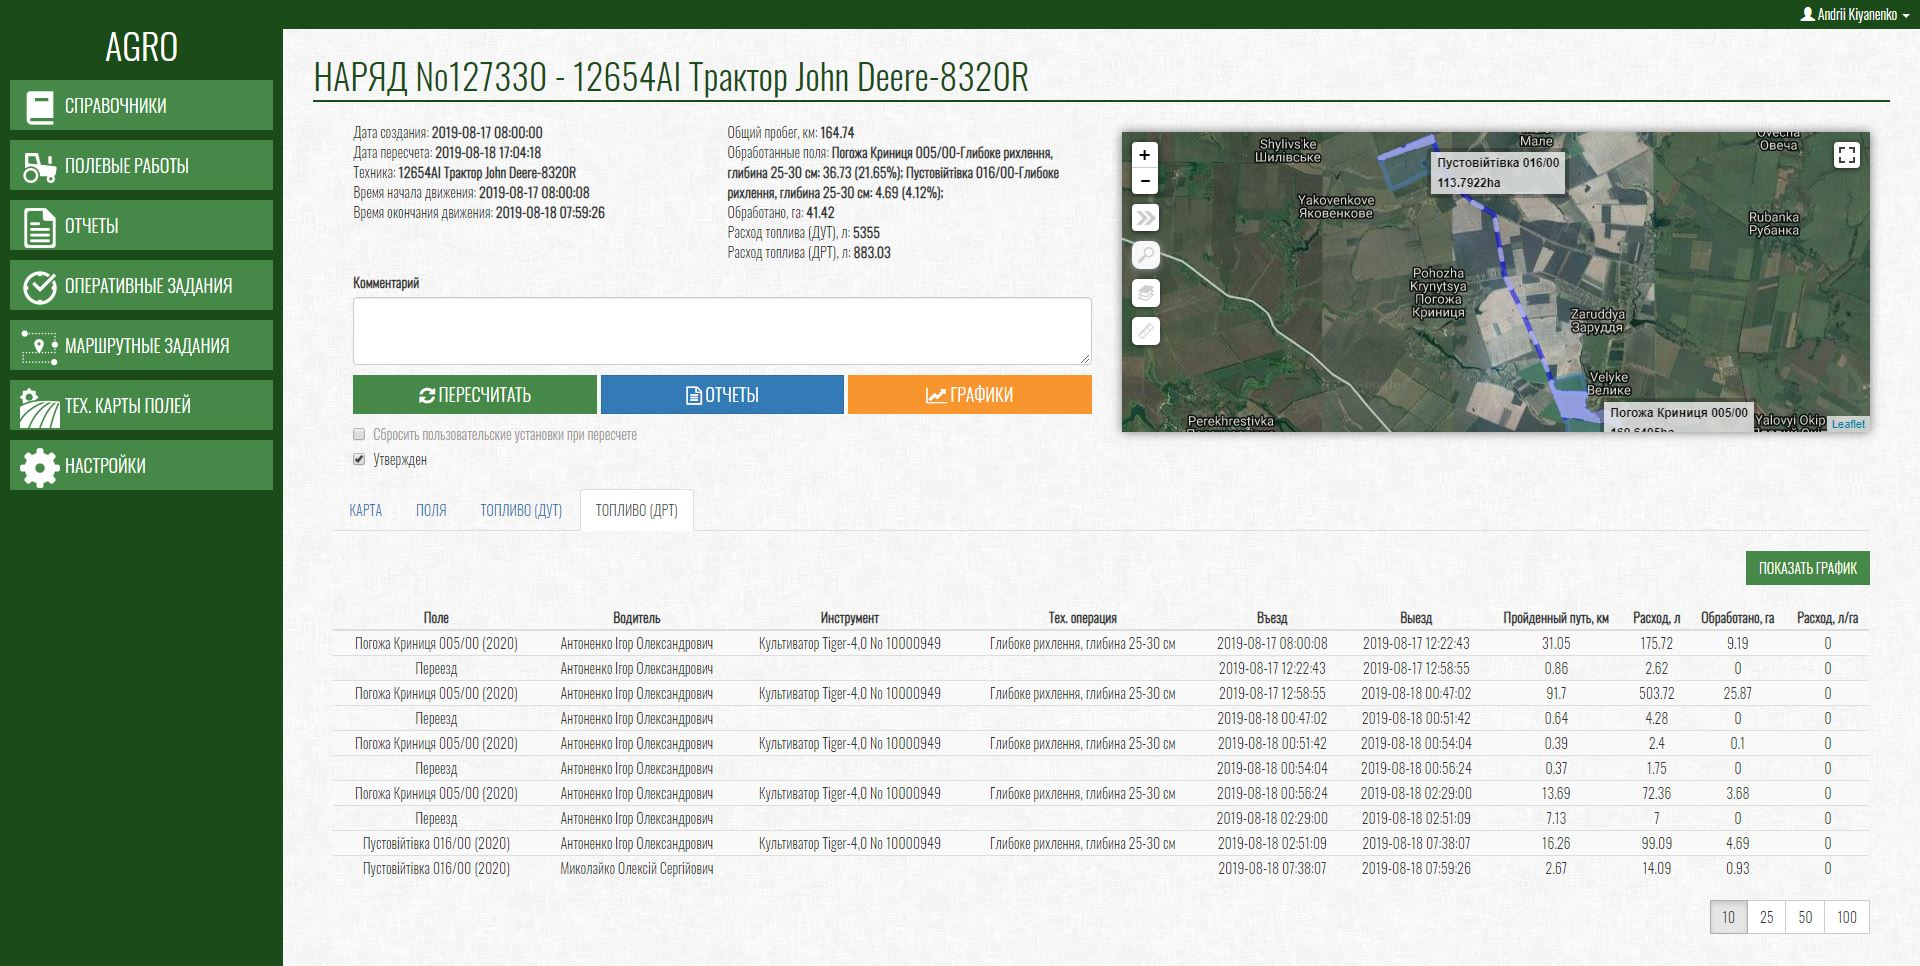 Пример модуля GPS-мониторинга